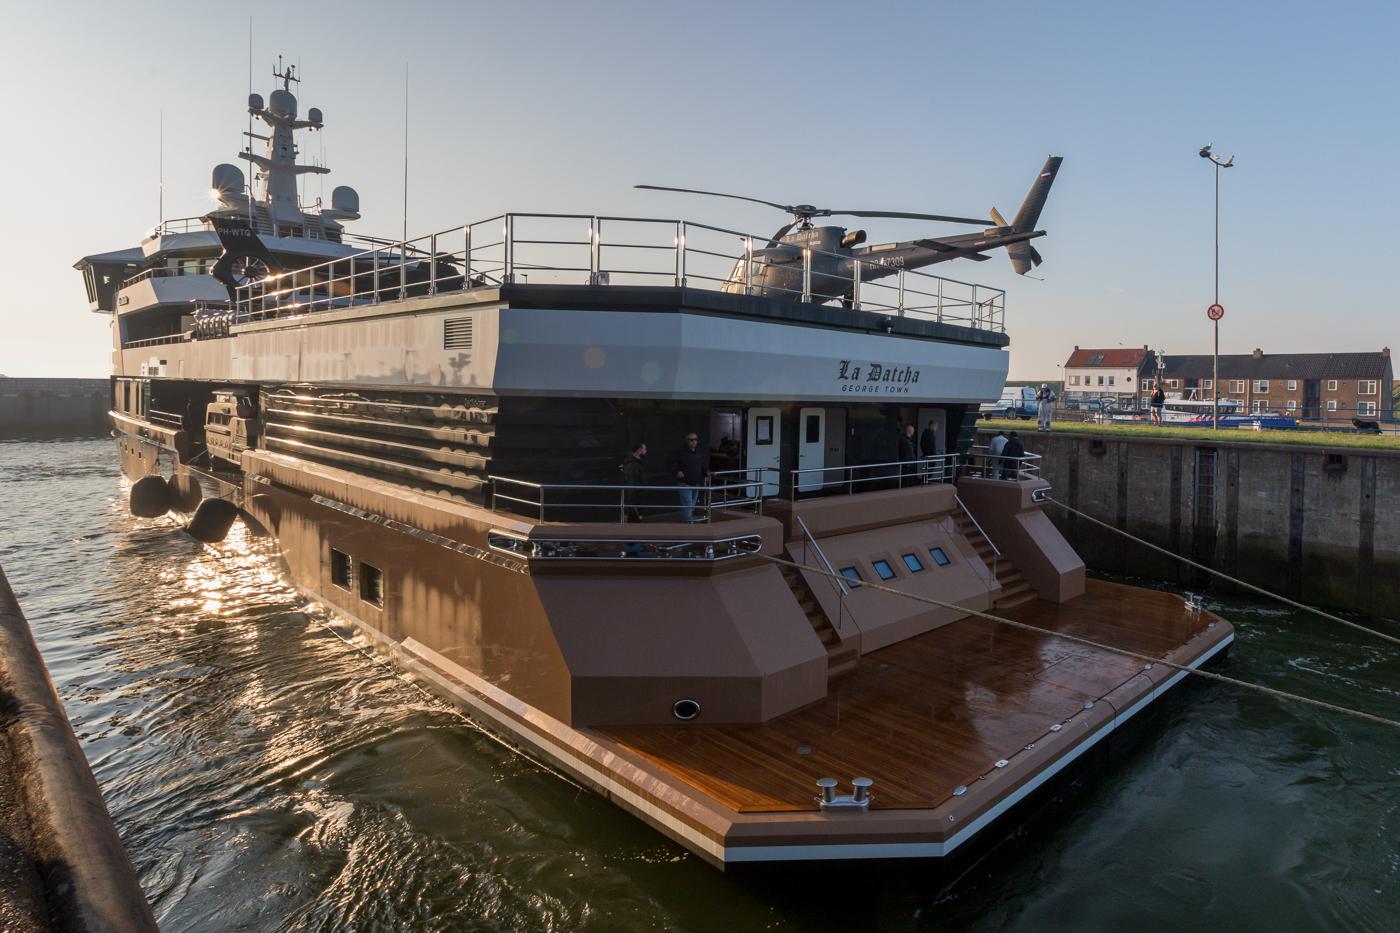 Yacht-La-Datcha-77-Heliski-Russia-15